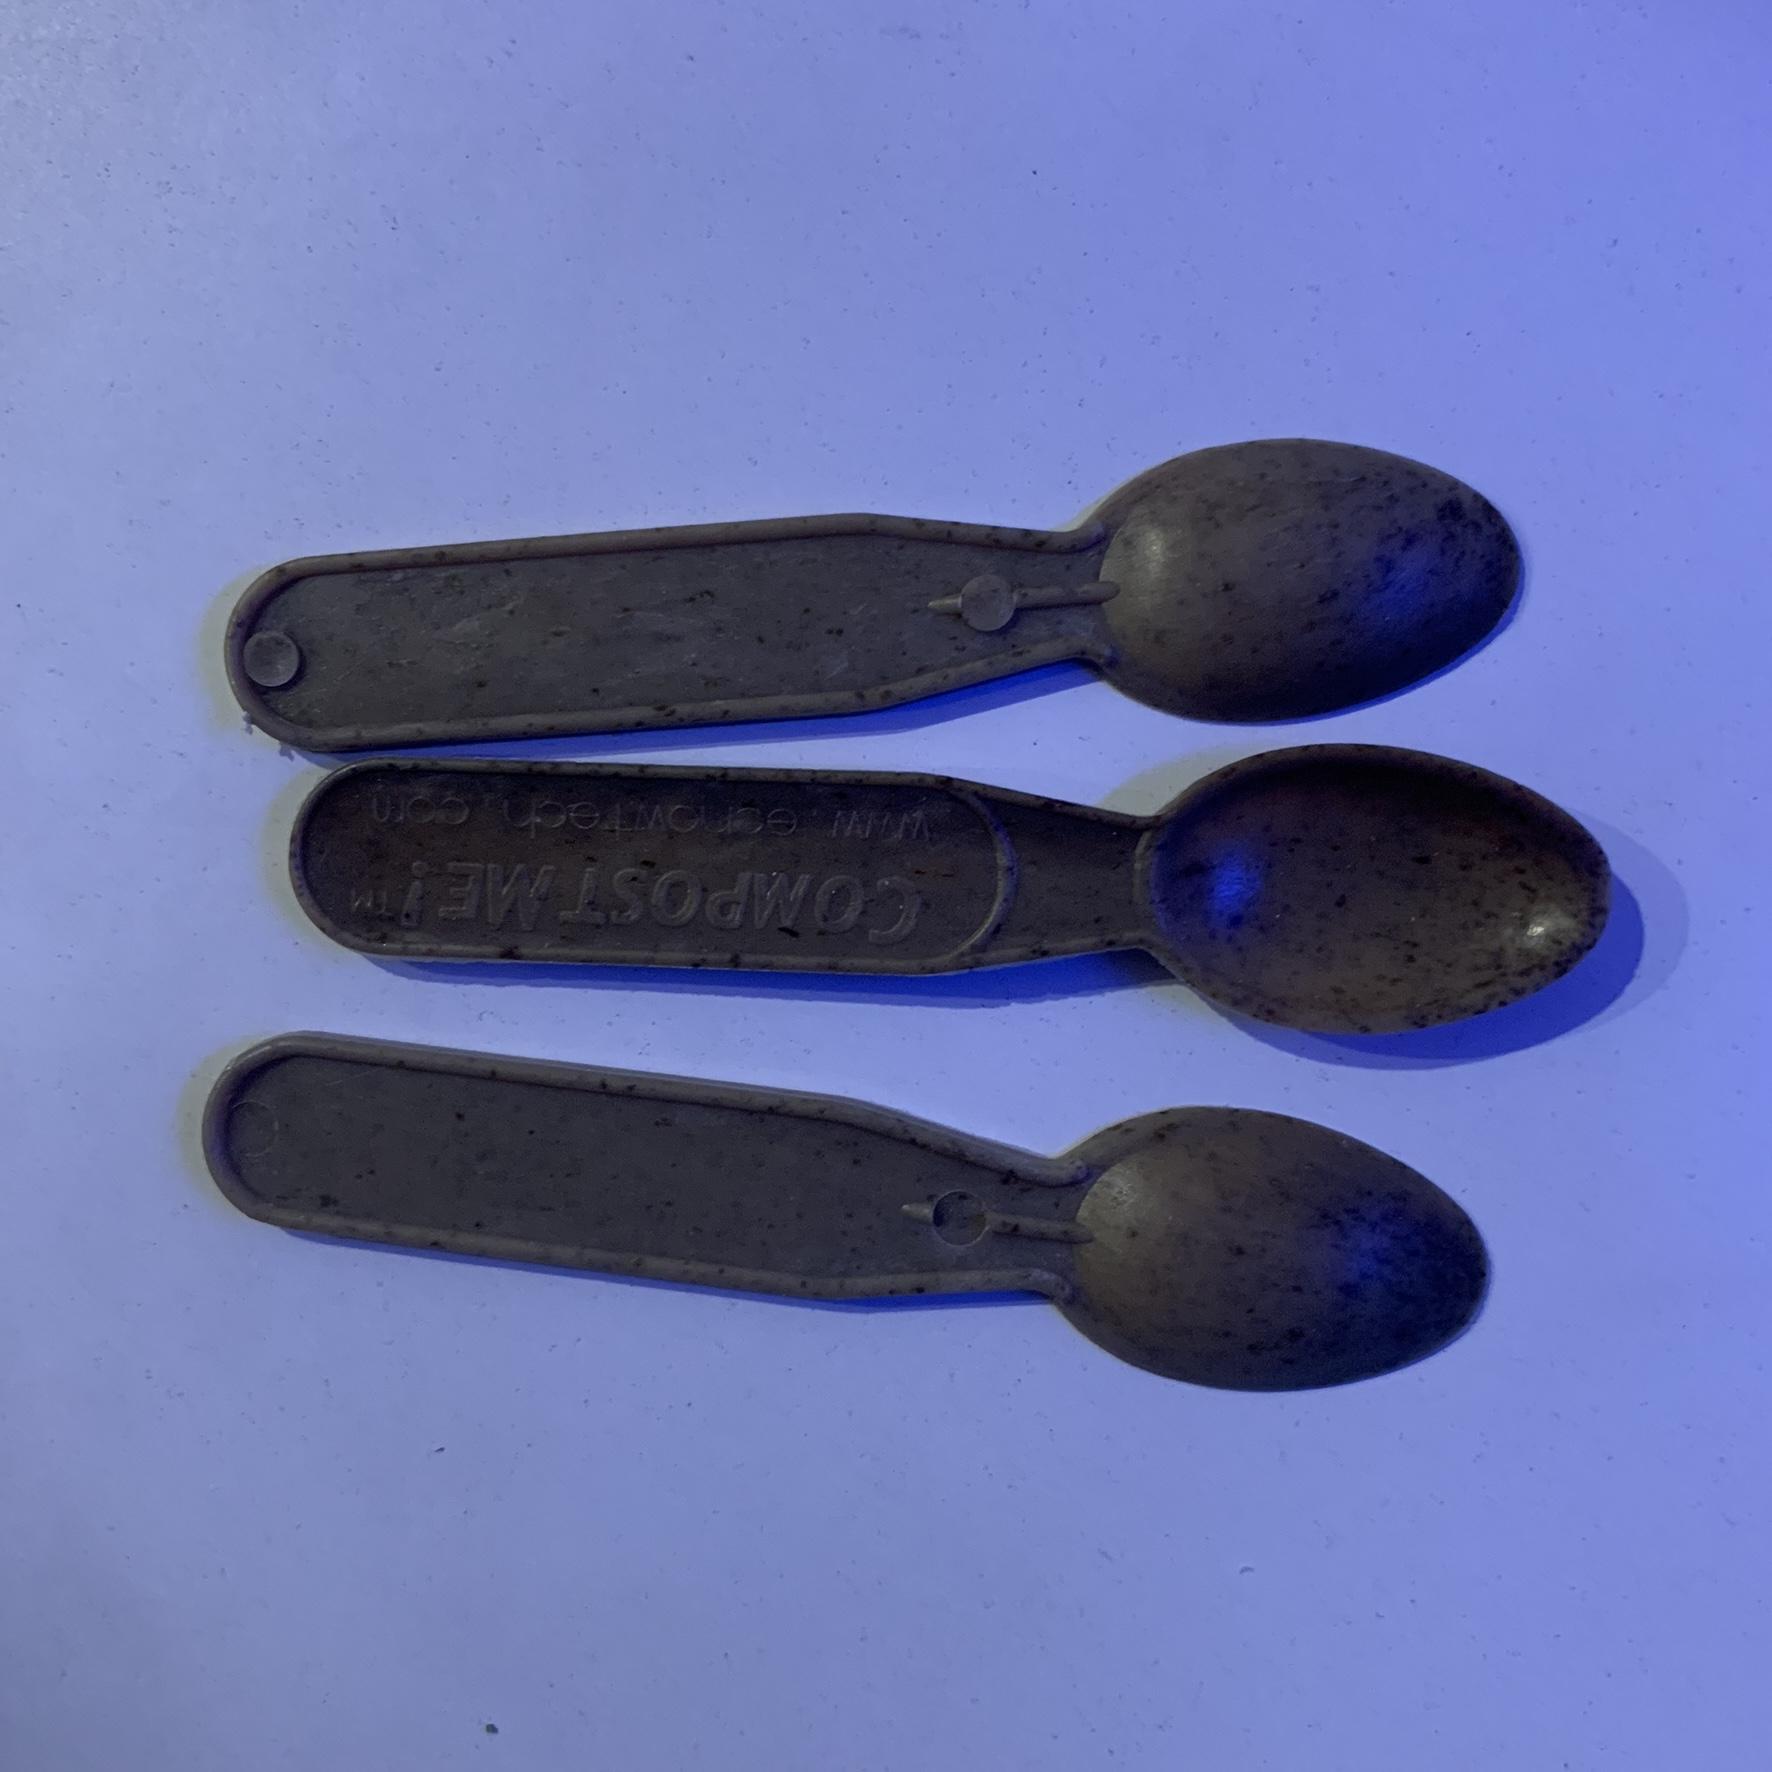 Biodegradable utensils